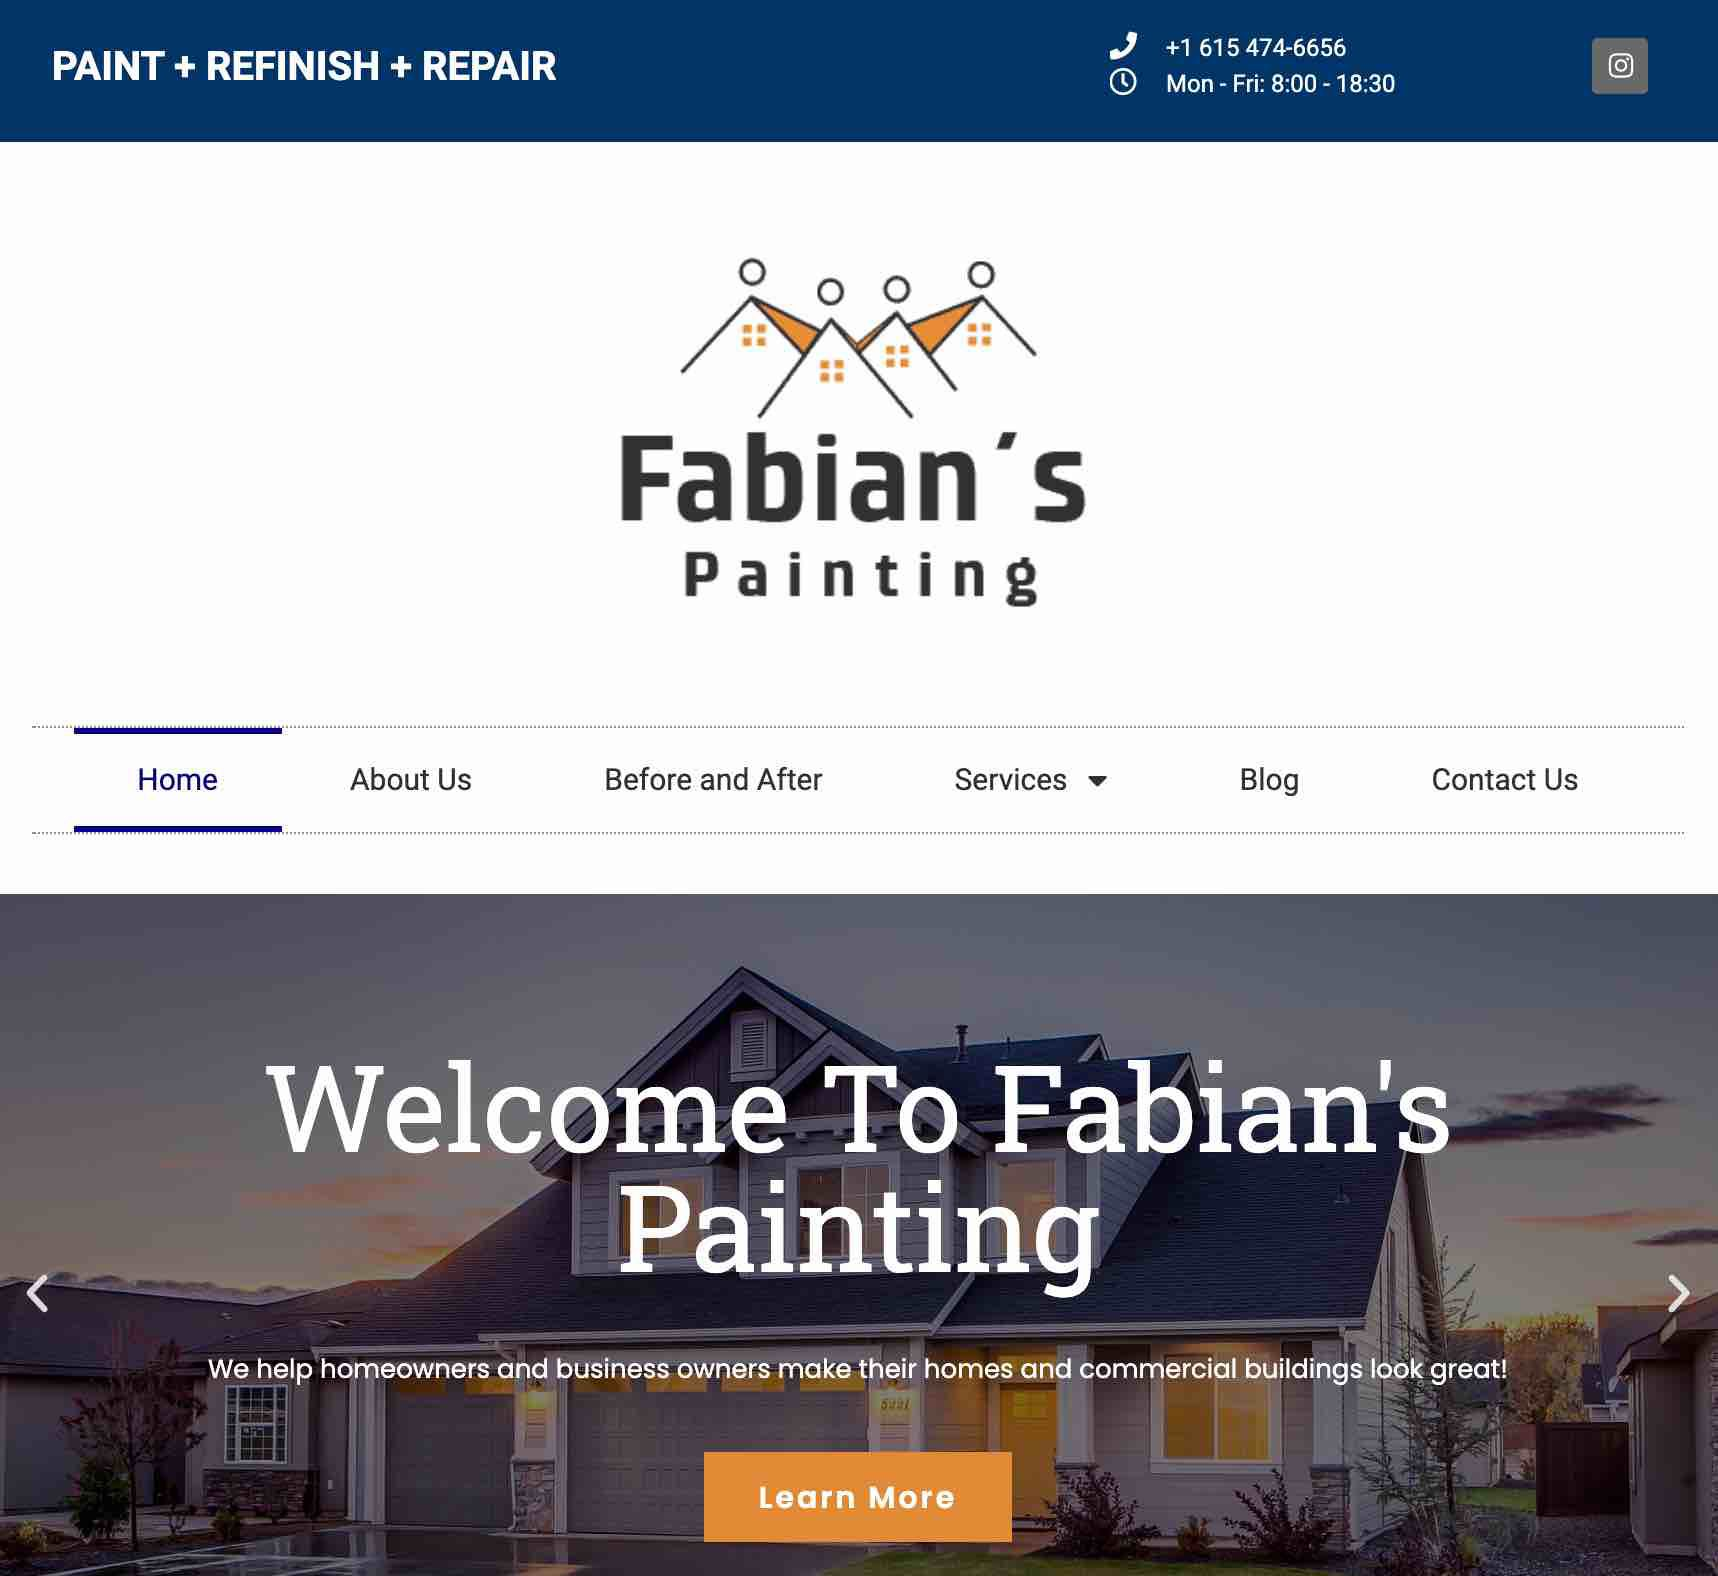 Fabian's Painting